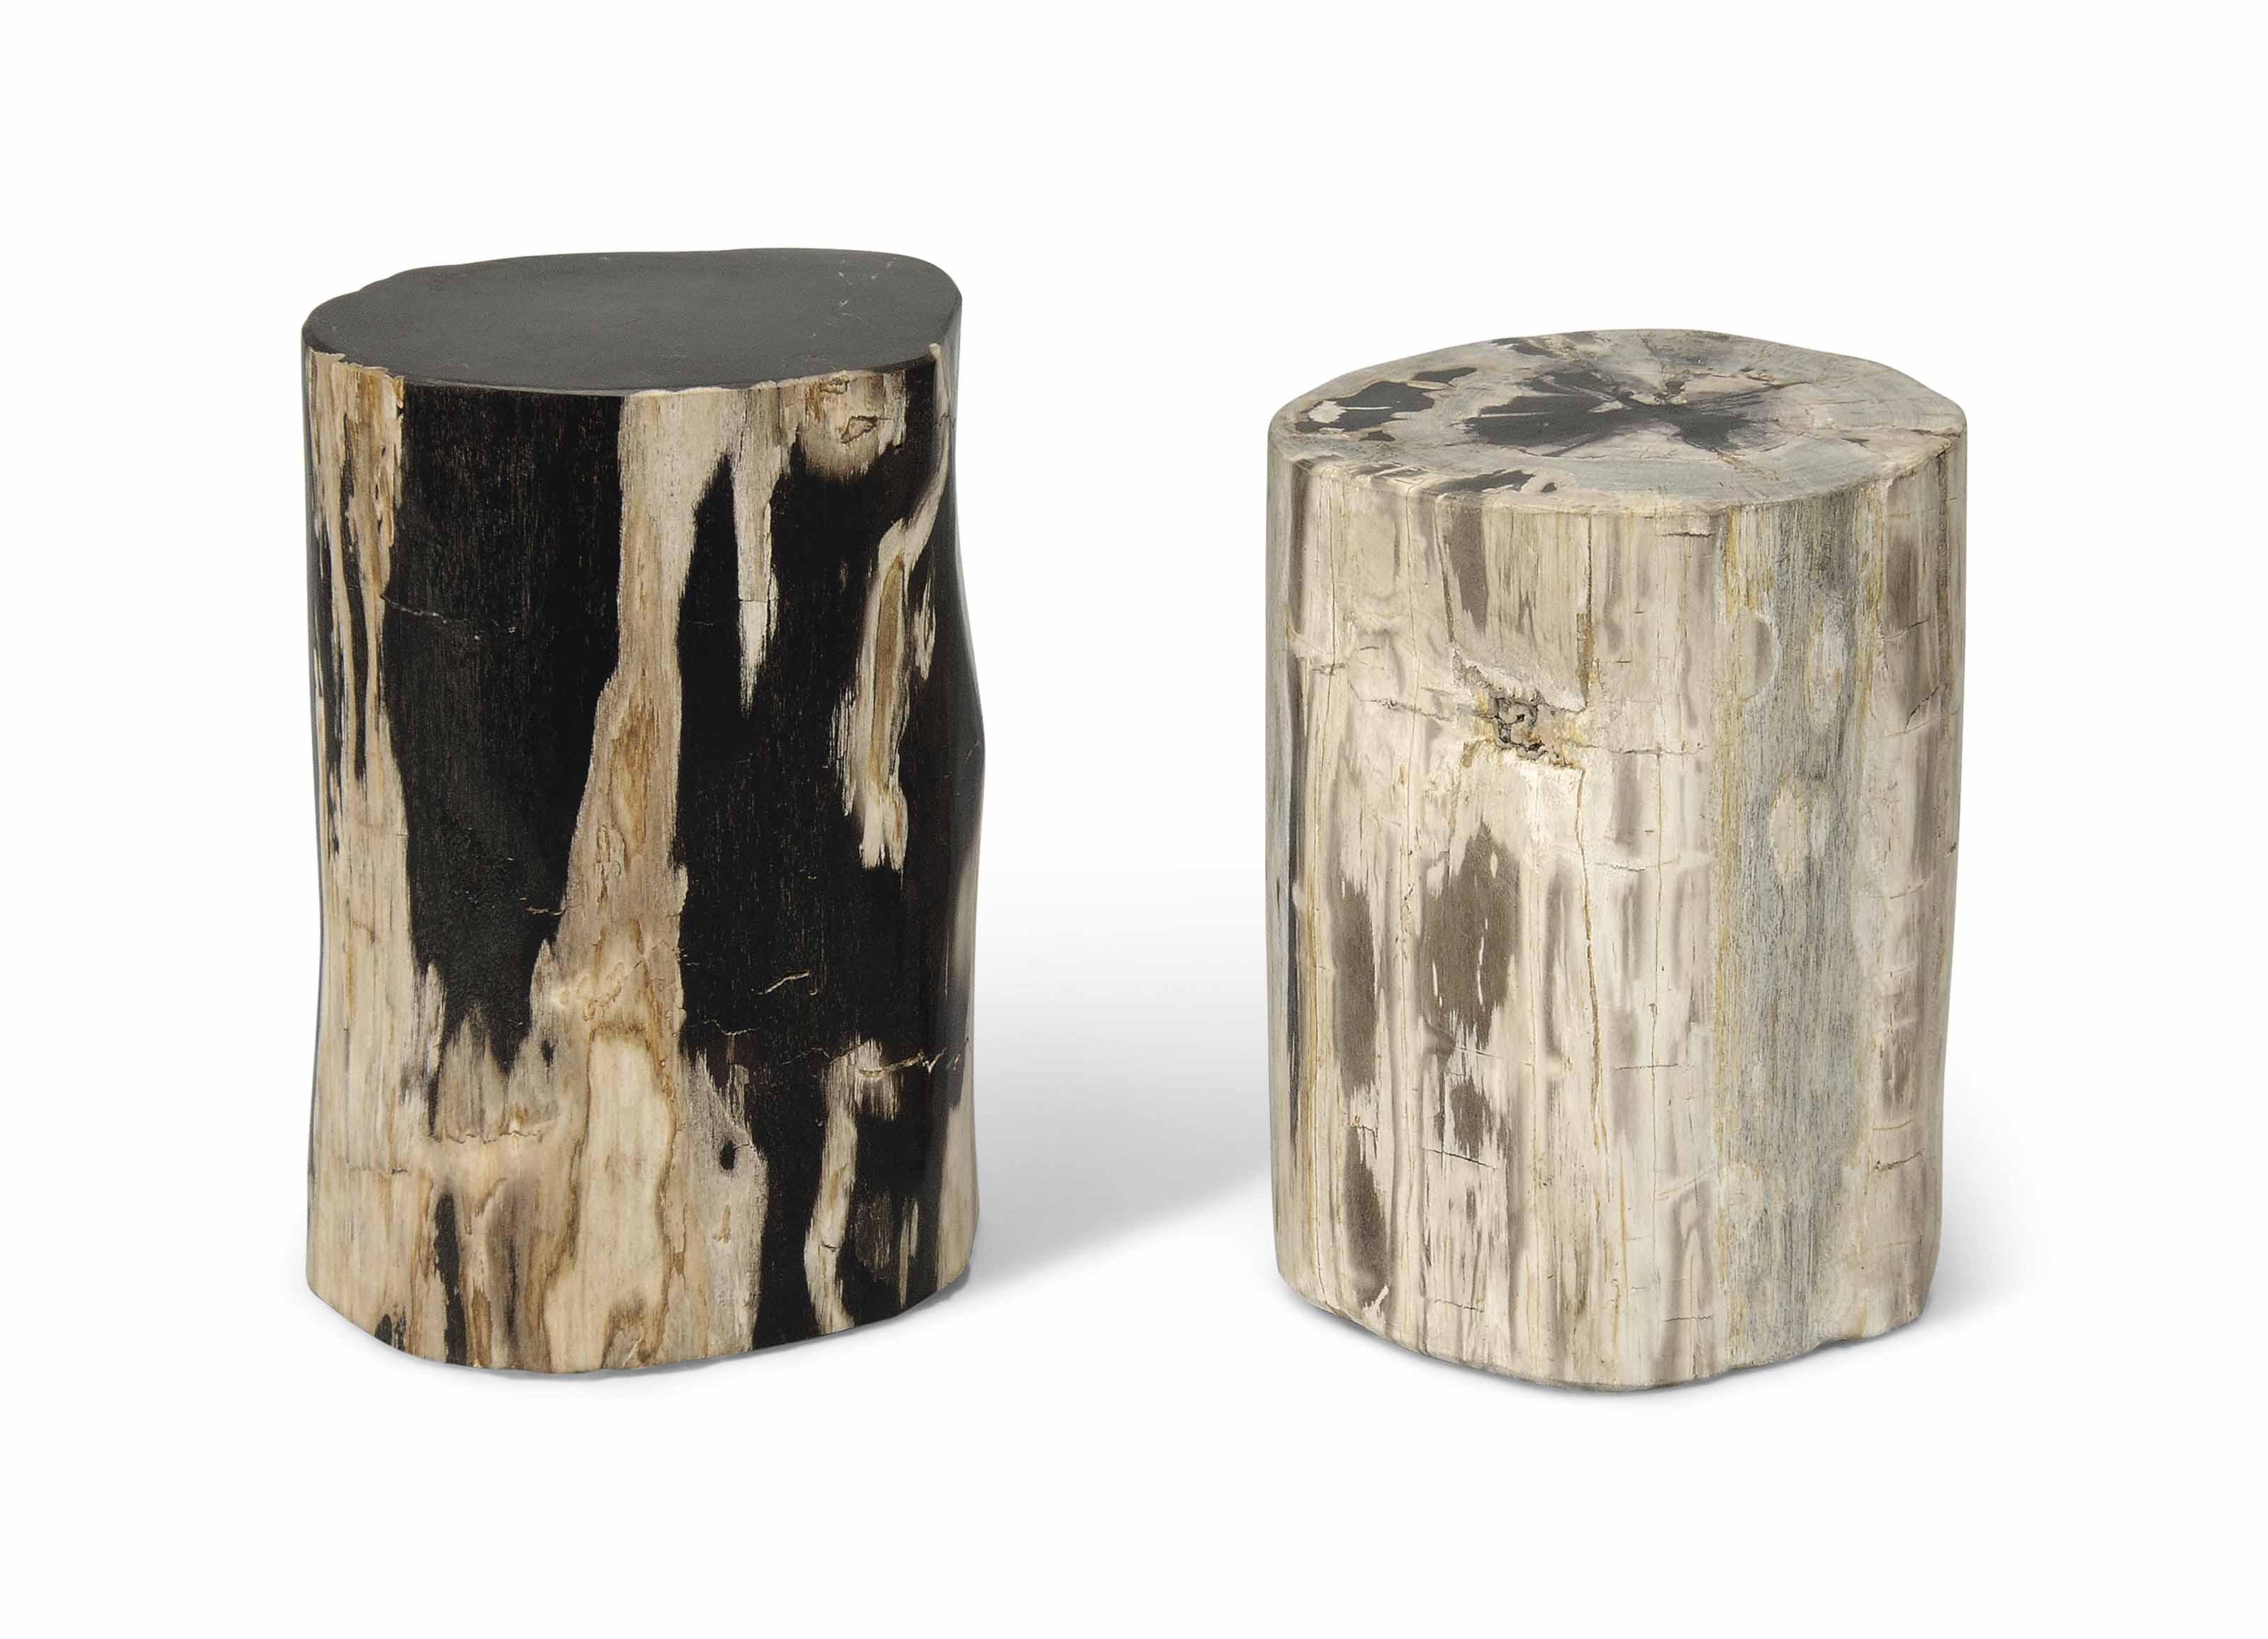 TWO PETRIFIED WOOD TREE SPECIM